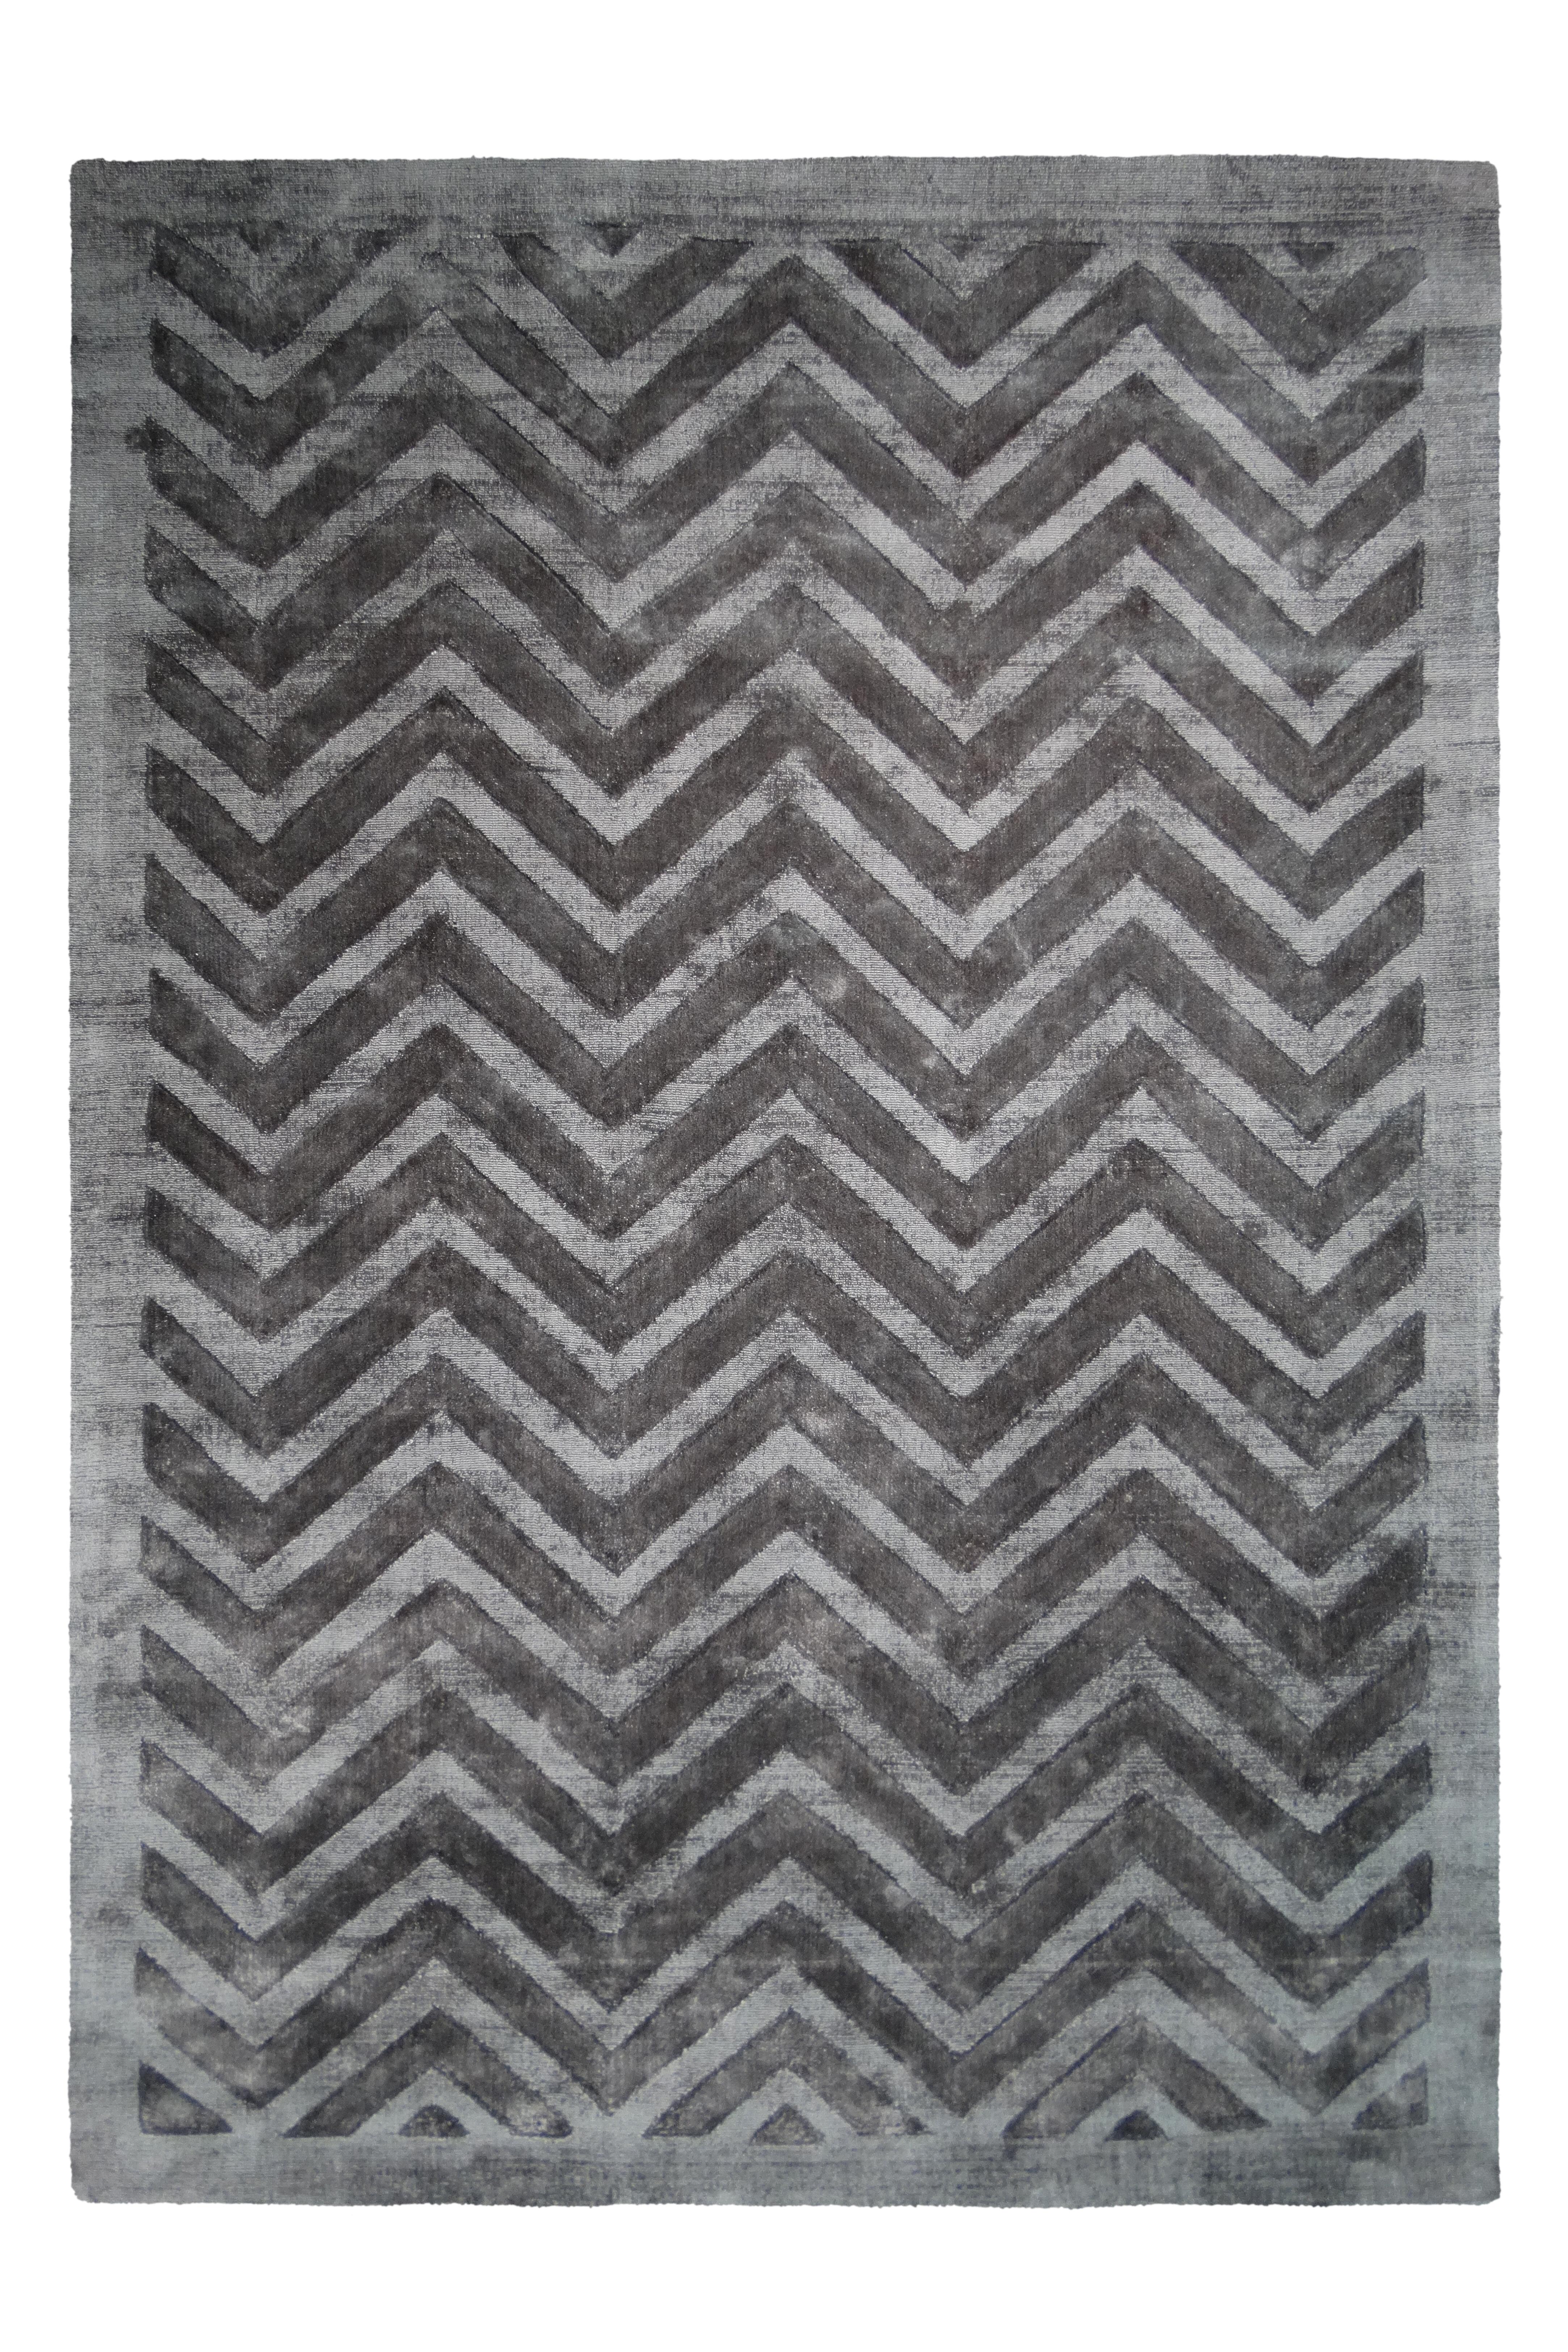 Kayoom Vloerkleed 'Luxury 410' kleur Grijs / Antraciet, 200 x 290cm